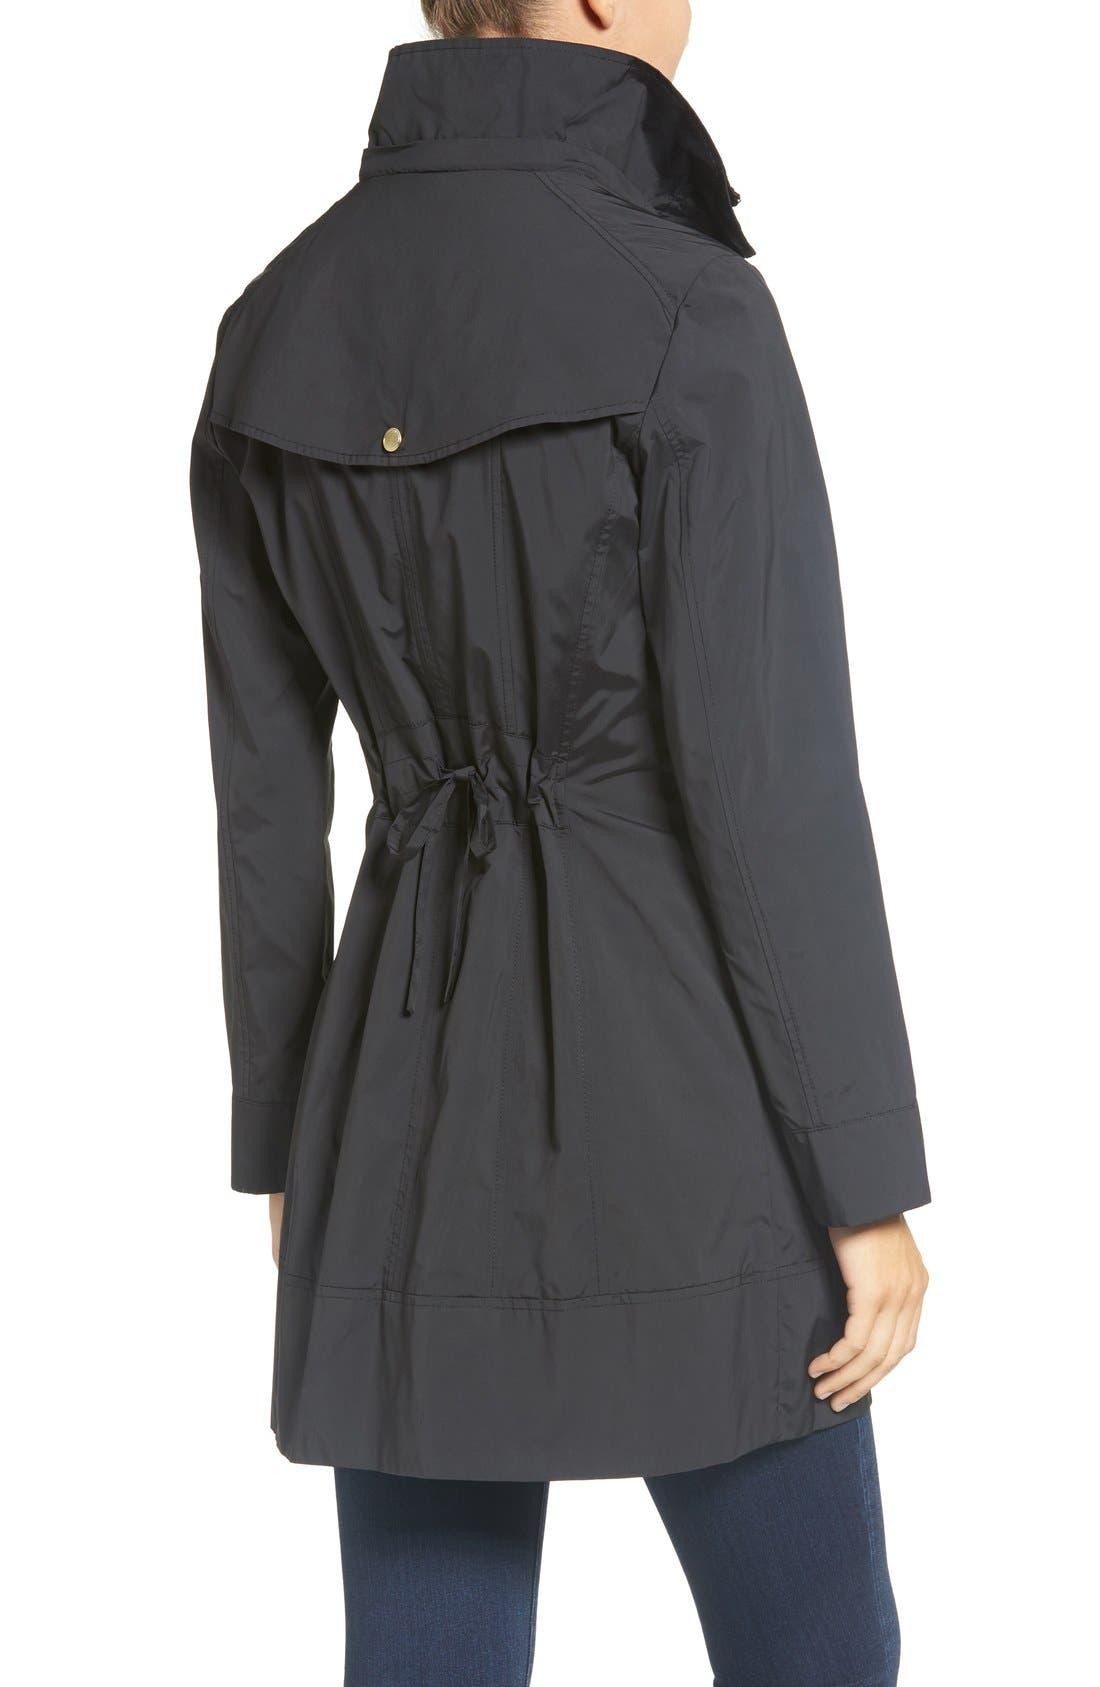 COLE HAAN SIGNATURE, Back Bow Packable Hooded Raincoat, Alternate thumbnail 4, color, BLACK